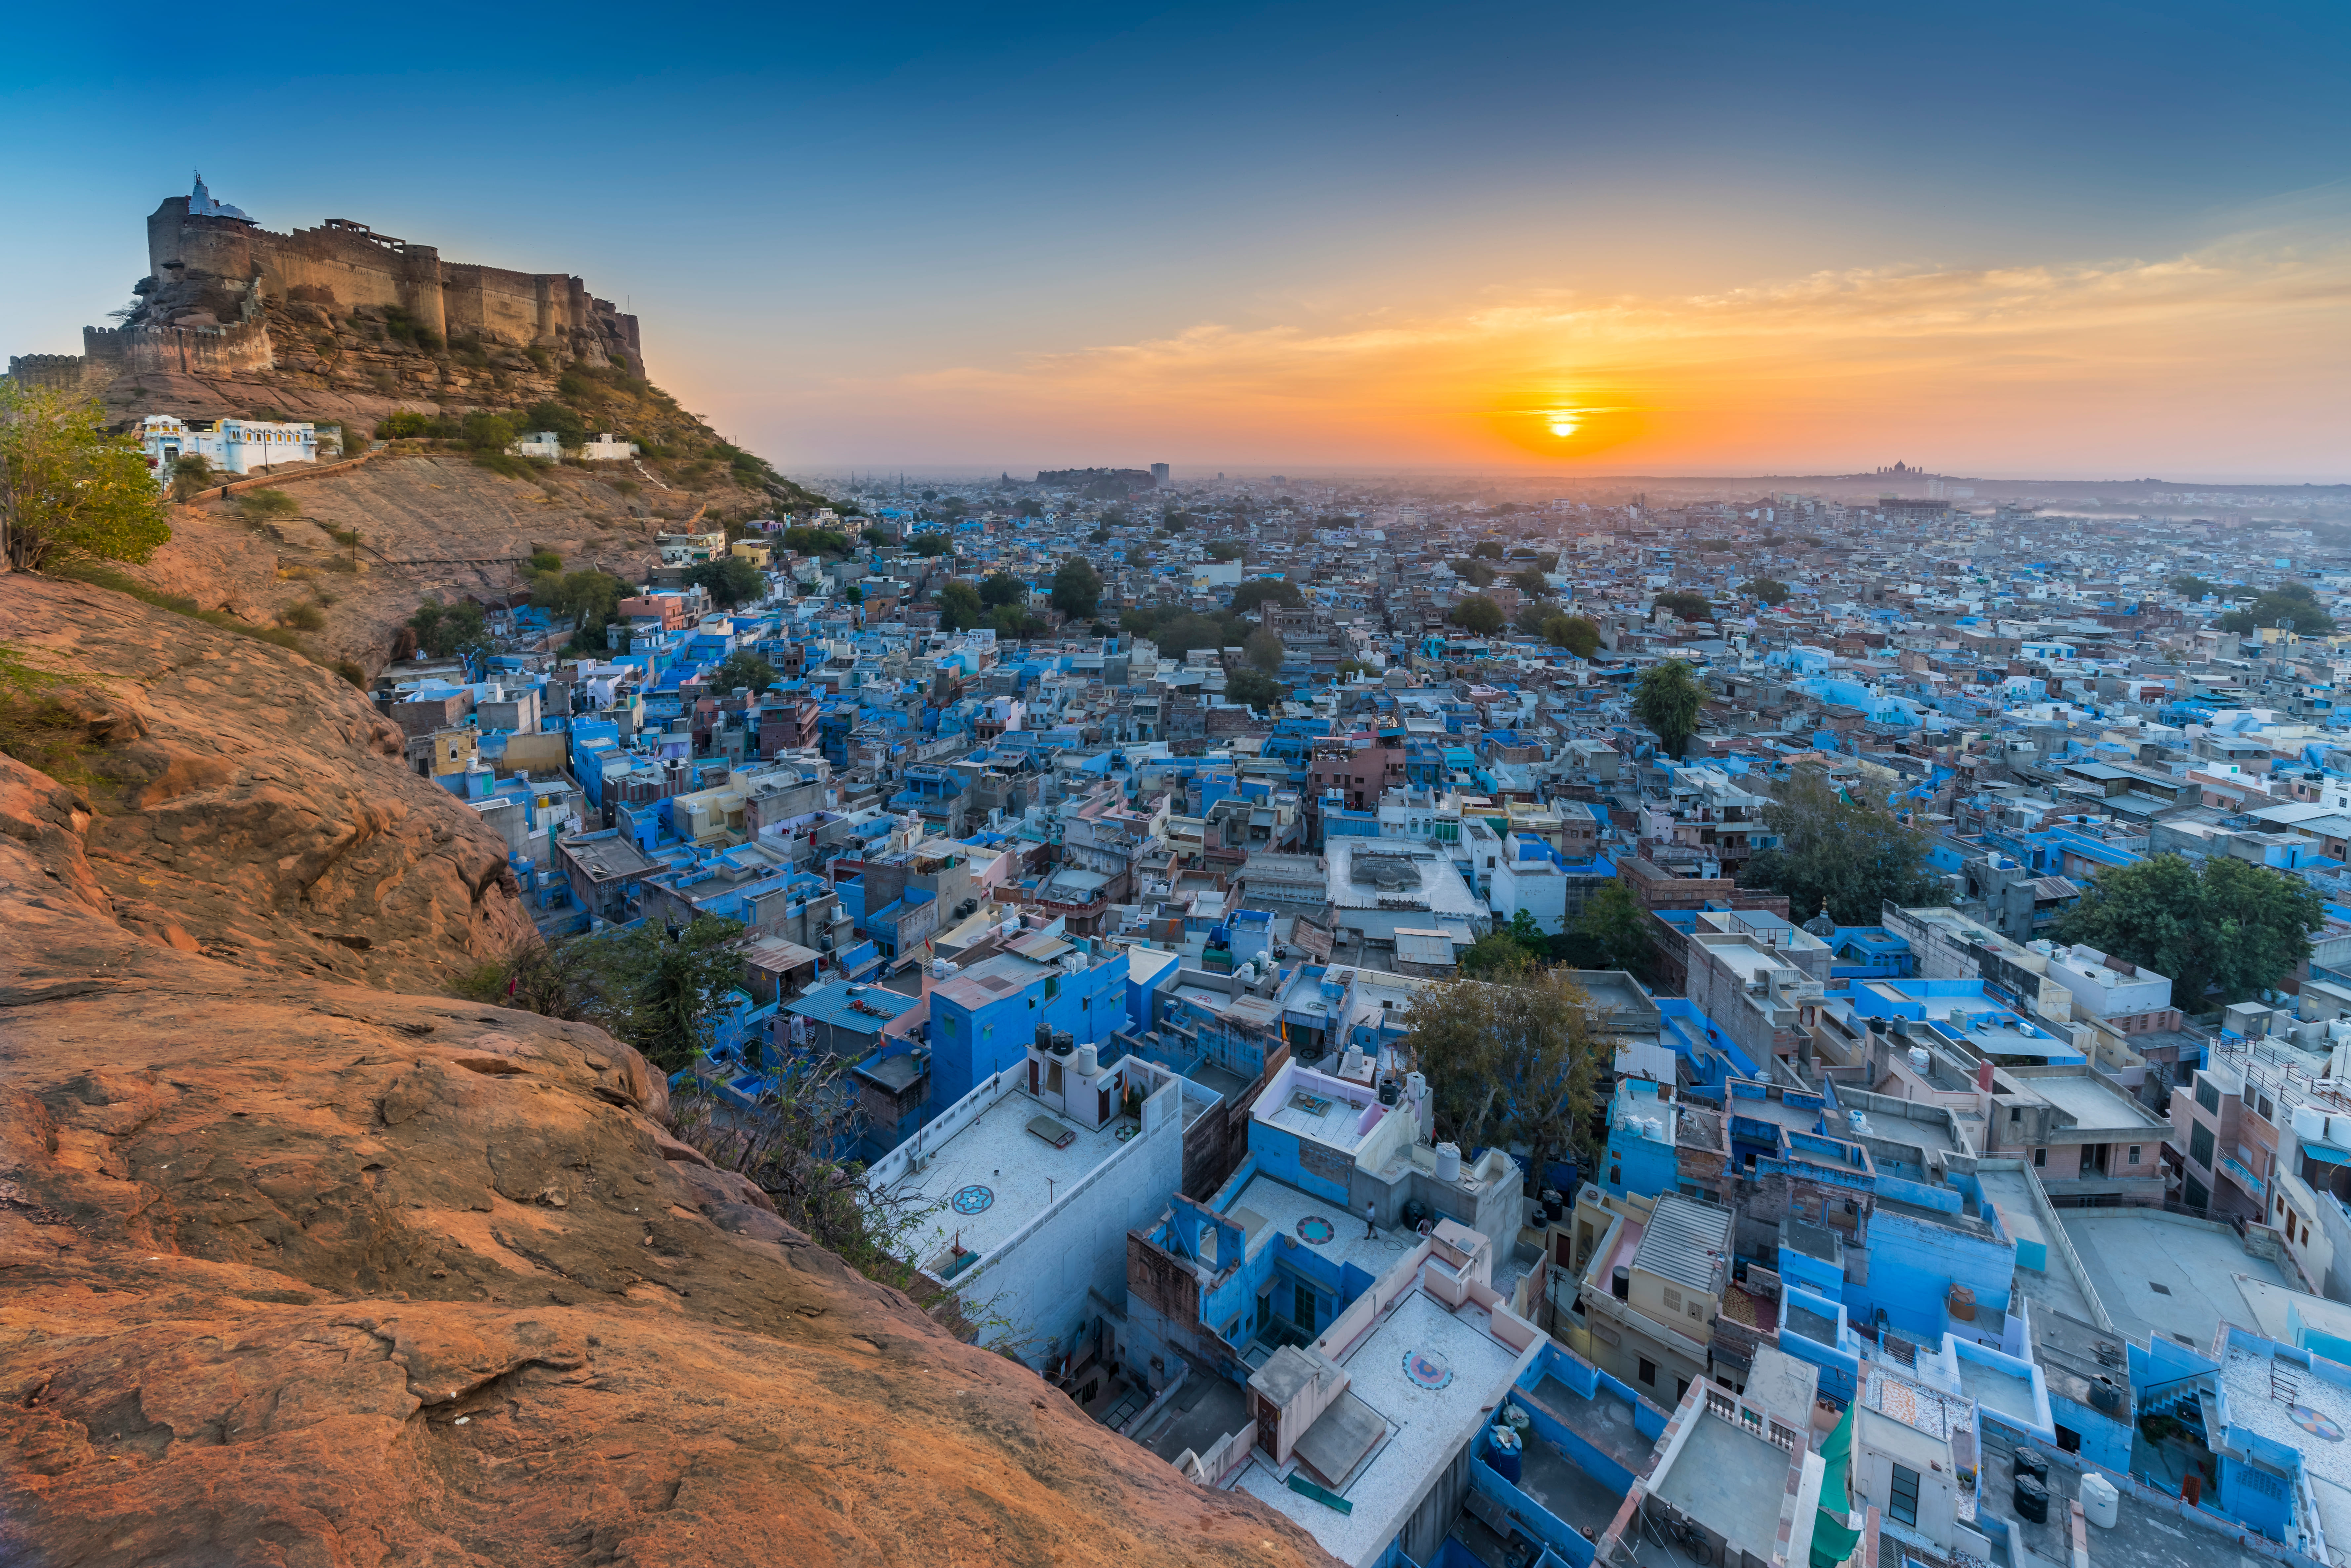 Jodhpur 'The Blue City'